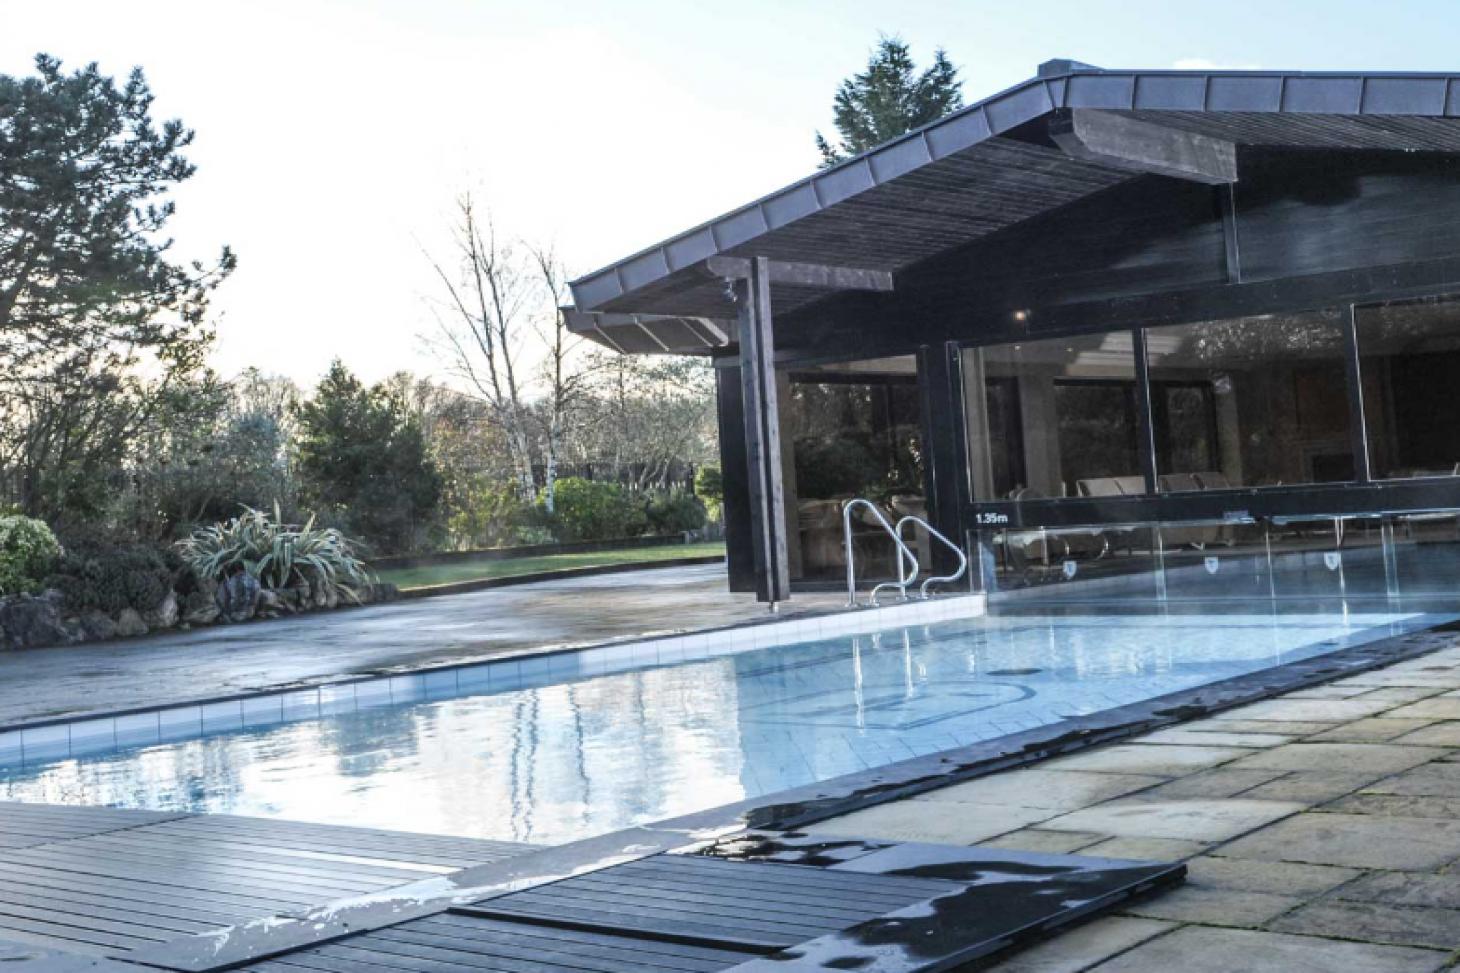 Fredricks Hotel Restaurant Spa Outdoor swimming pool